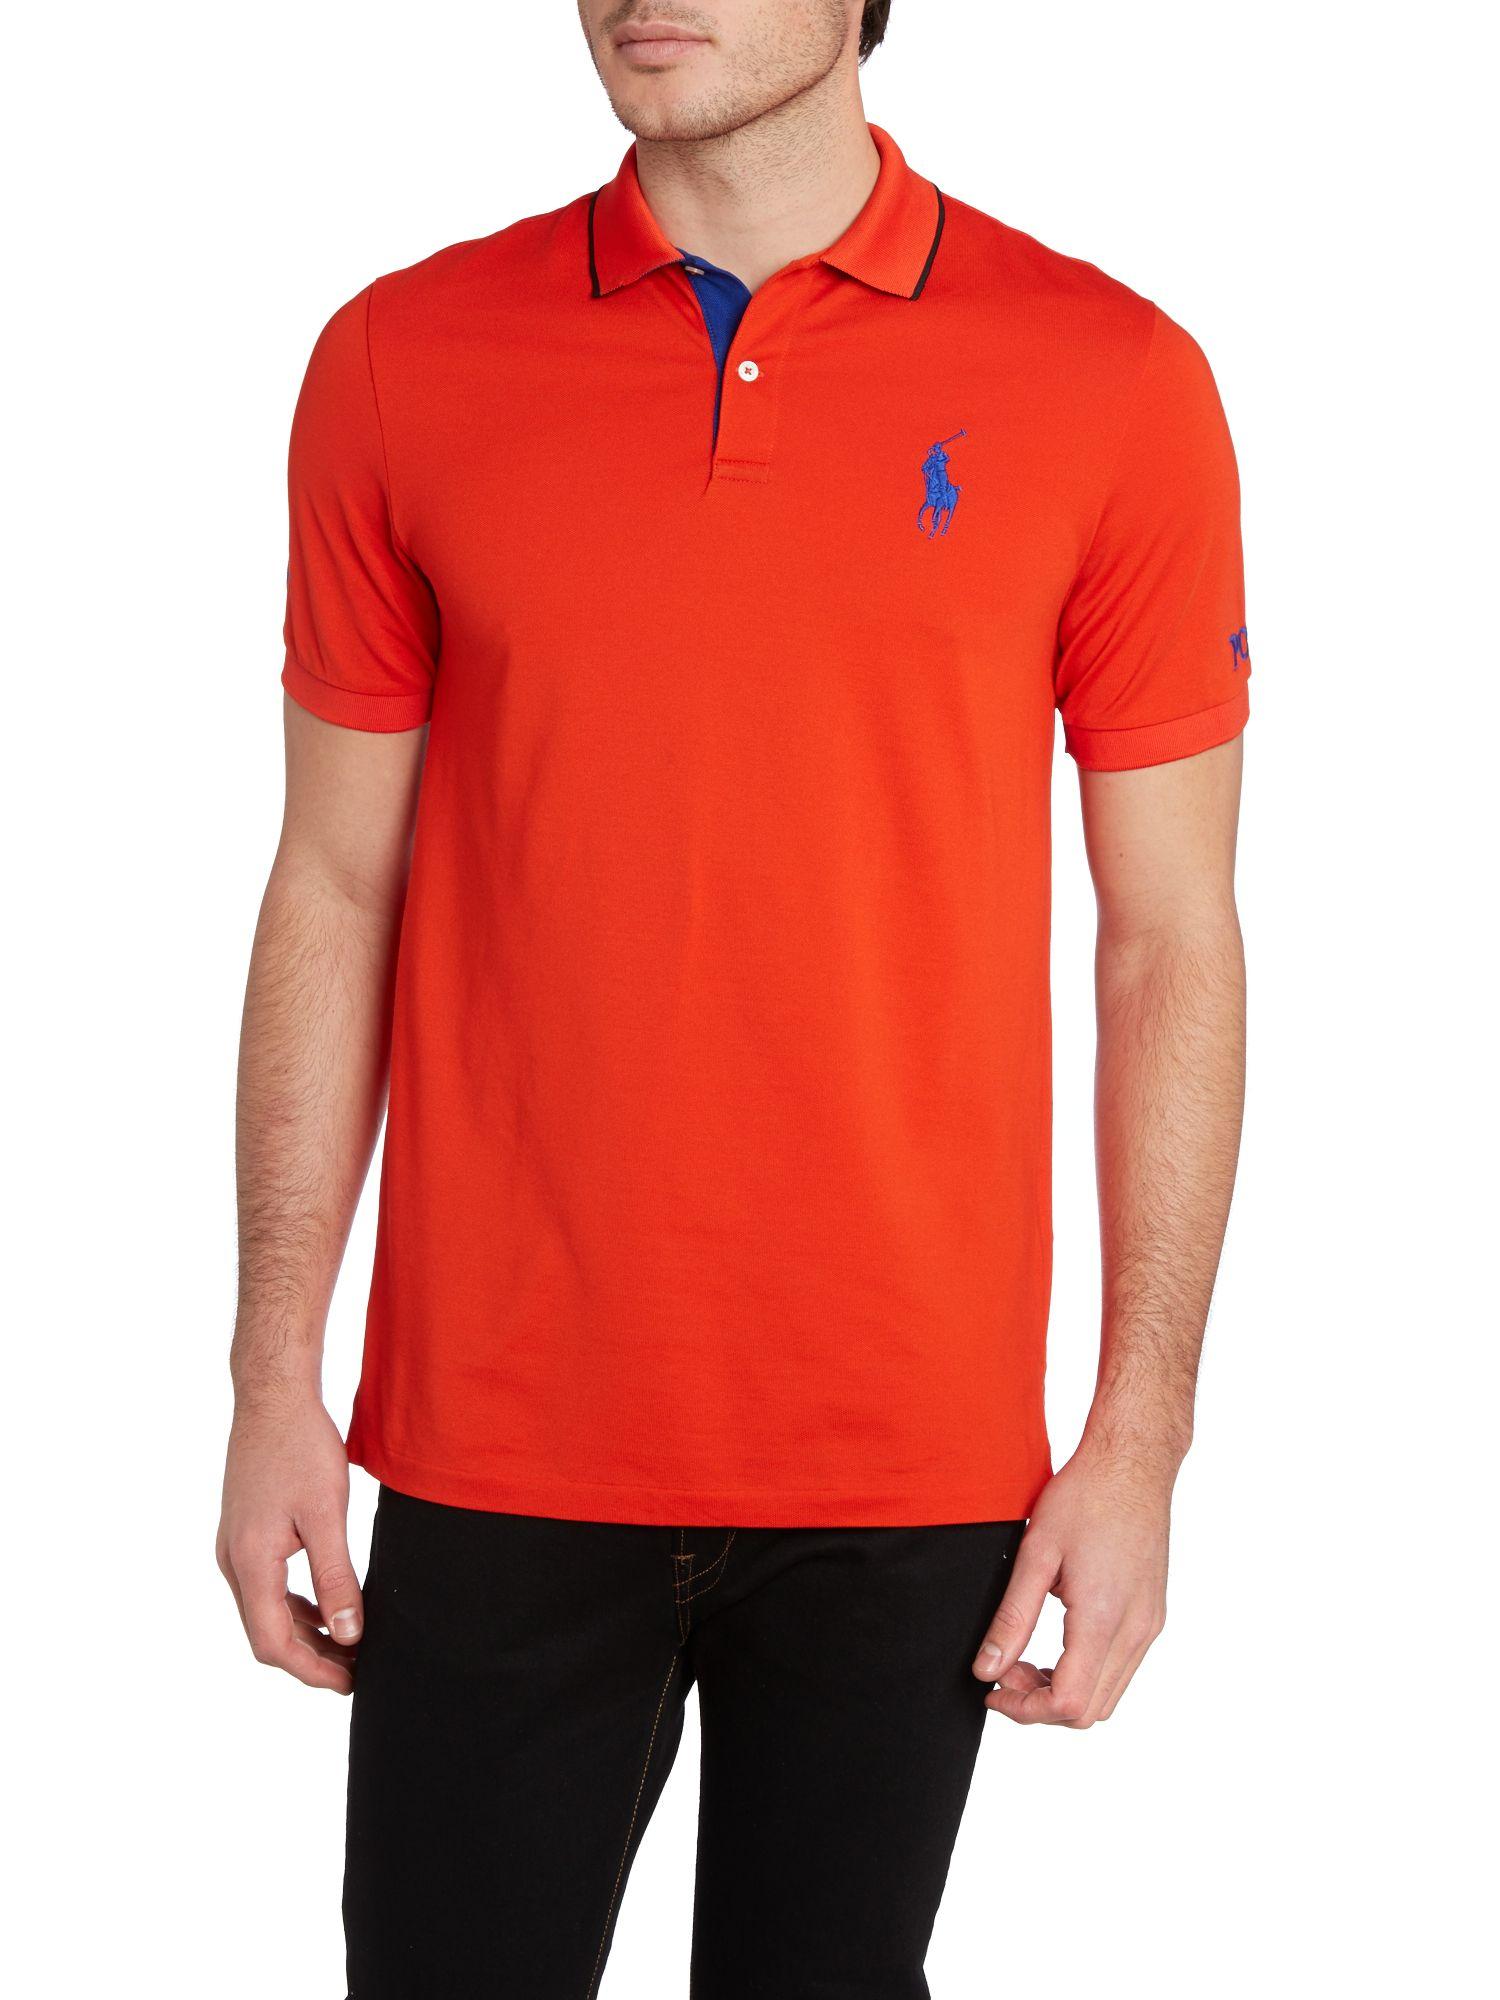 Marein Discount Ralph Lauren Polo Golf Shirts